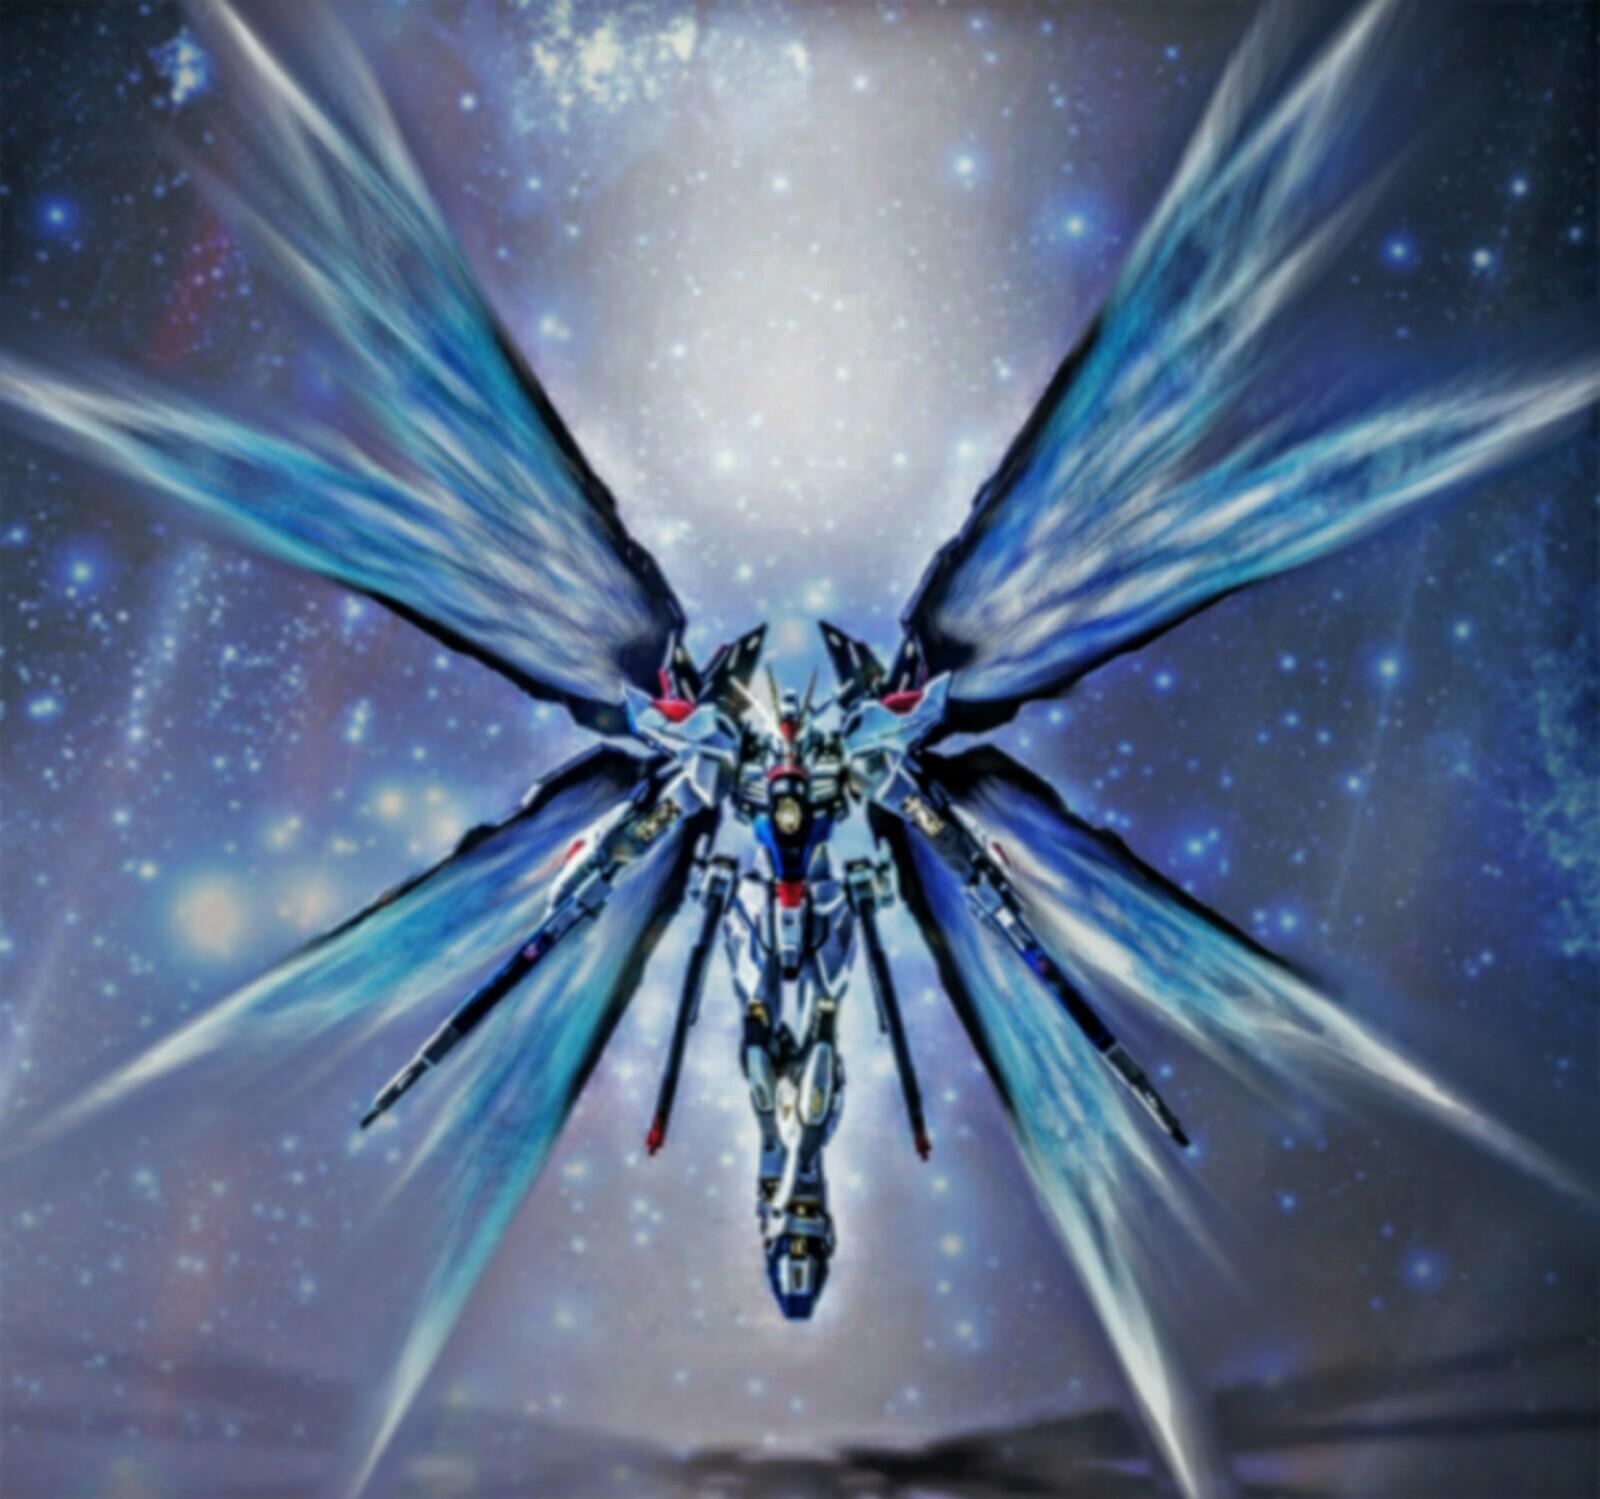 Strike Freedom Wings of Light by ajckh2 on DeviantArt